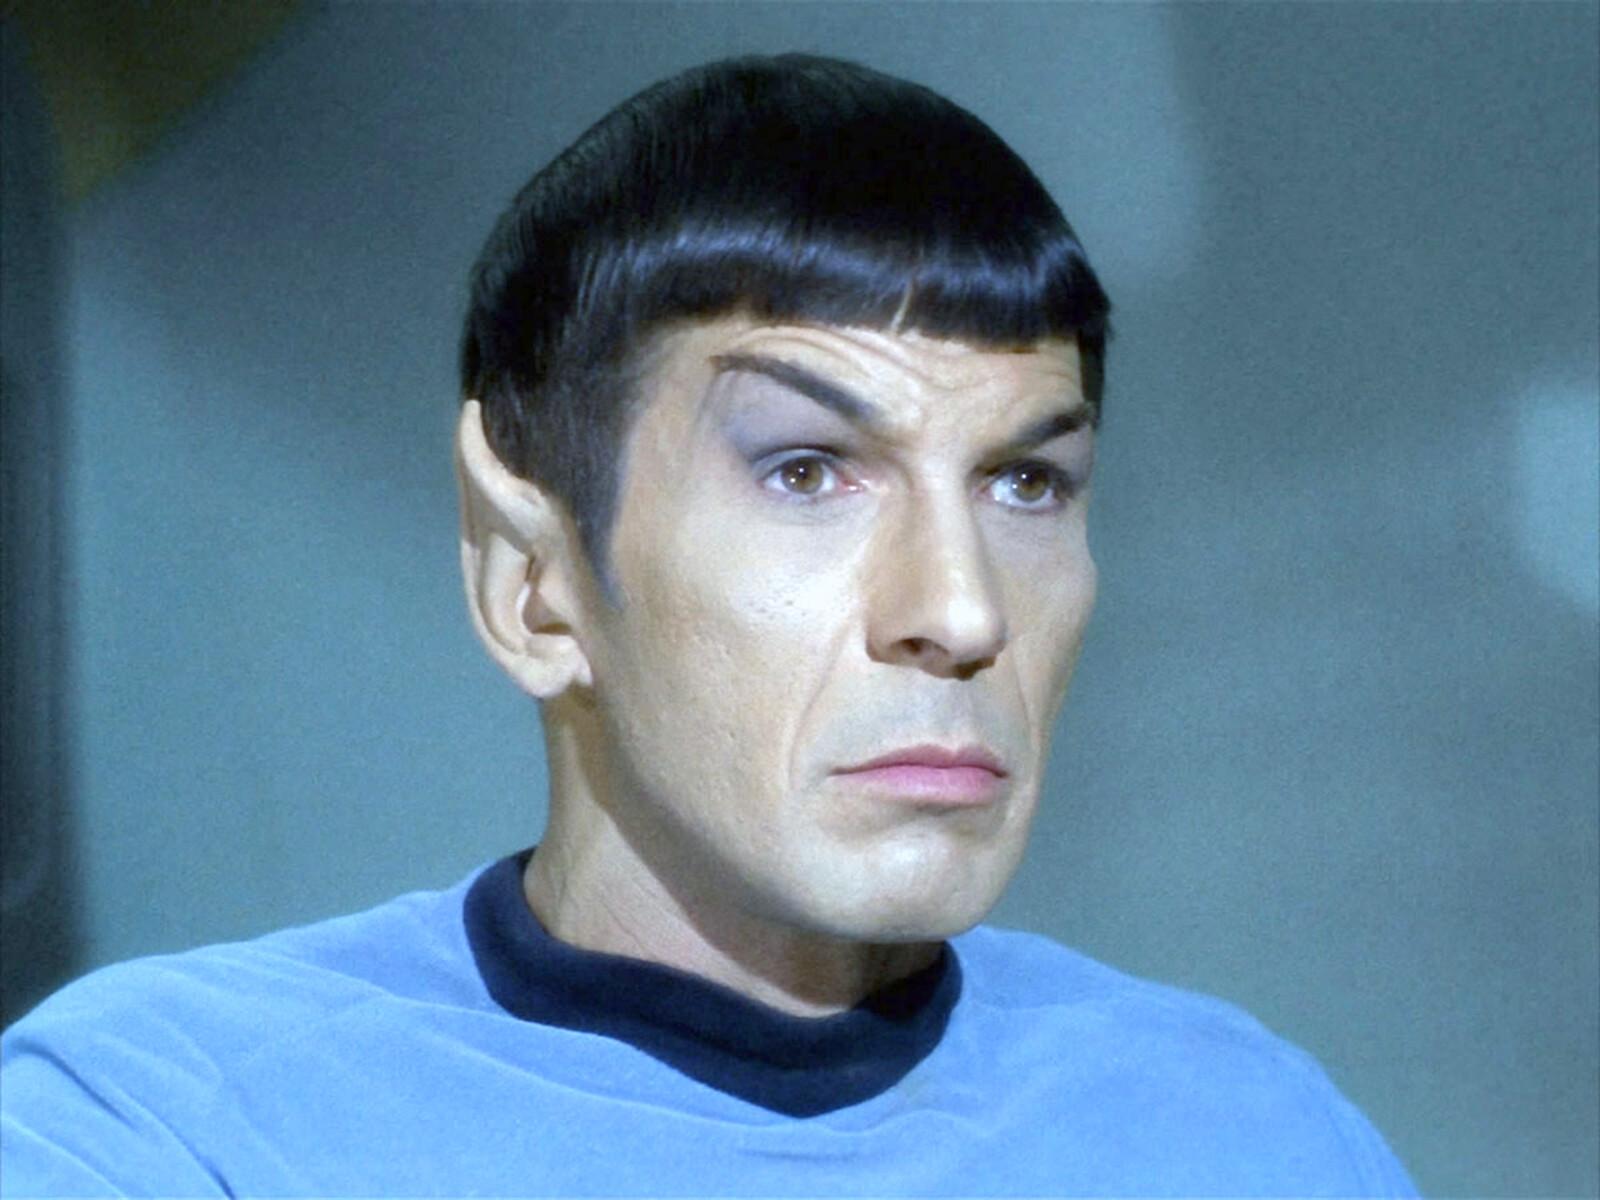 Image of Spock from Star Trek: The Original Series